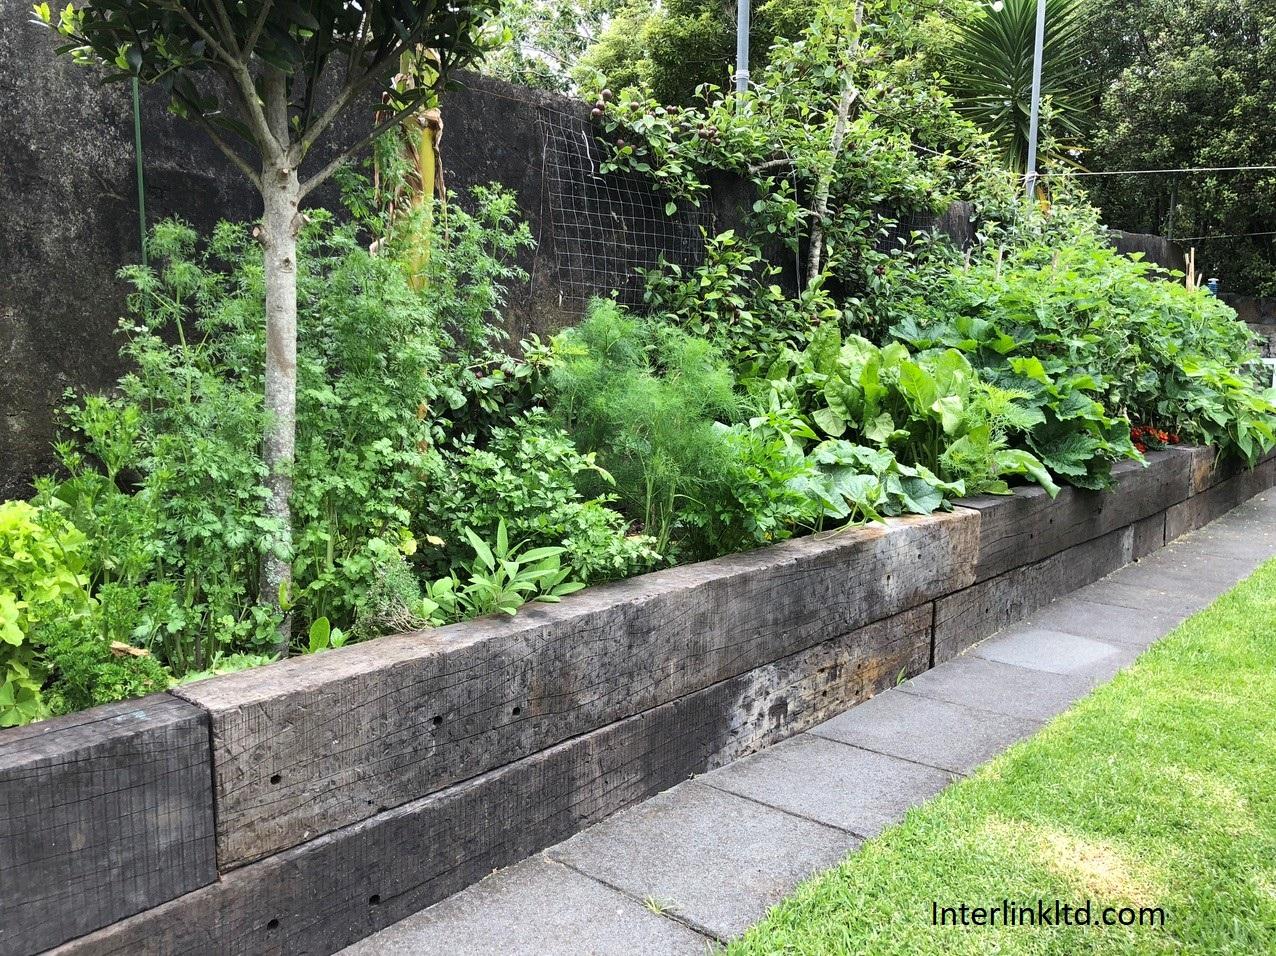 AA - Grade railway sleepers planter box